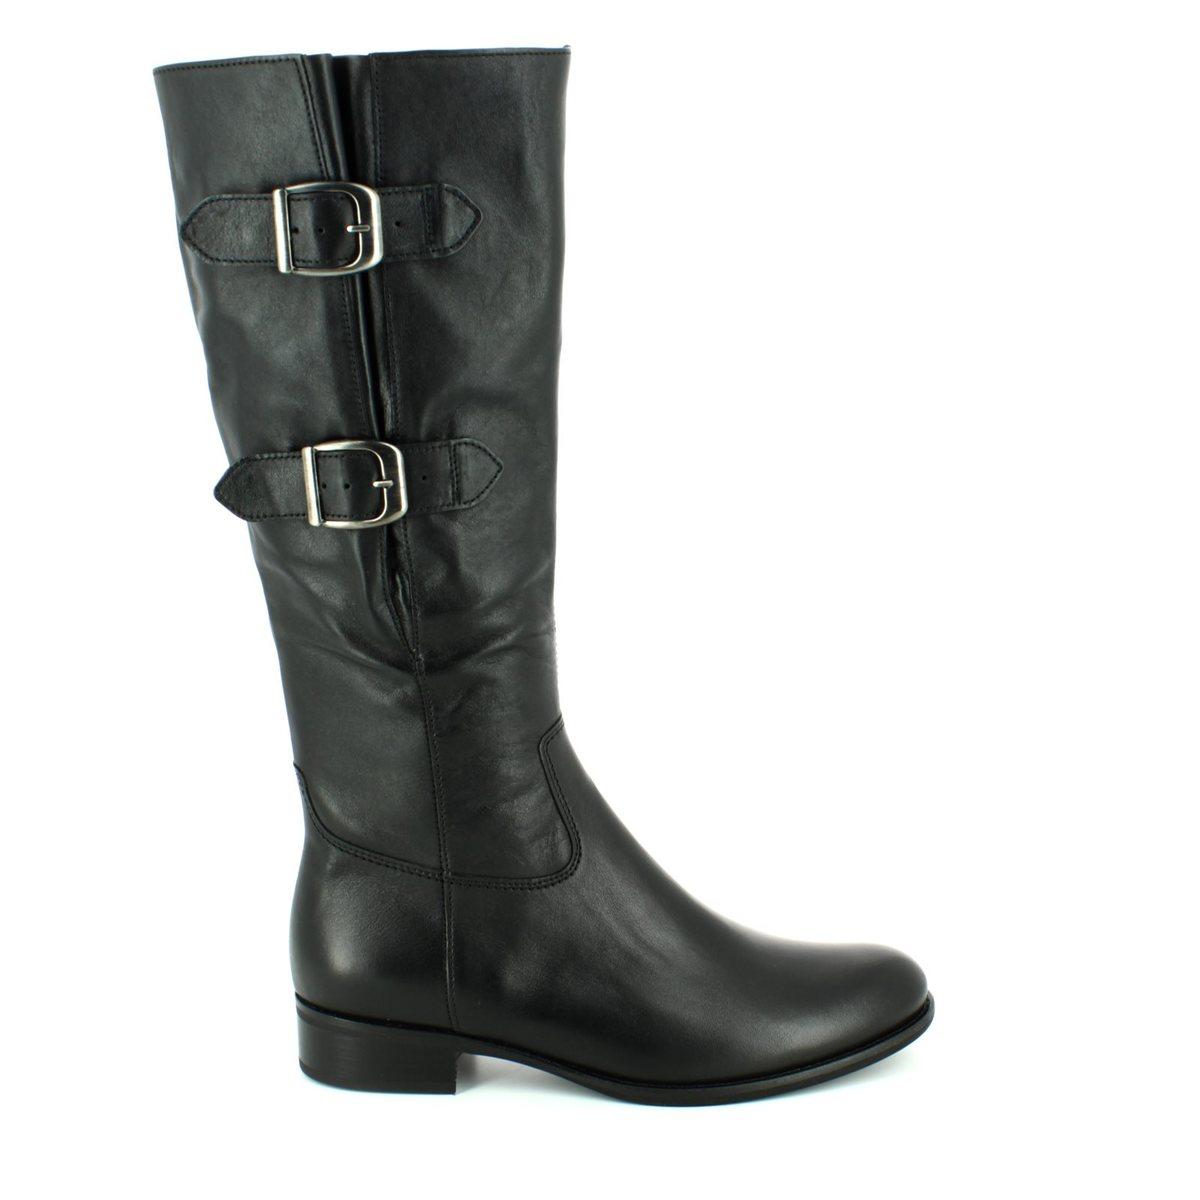 Gabor Astoria 71 636 27 Black Knee High Boots